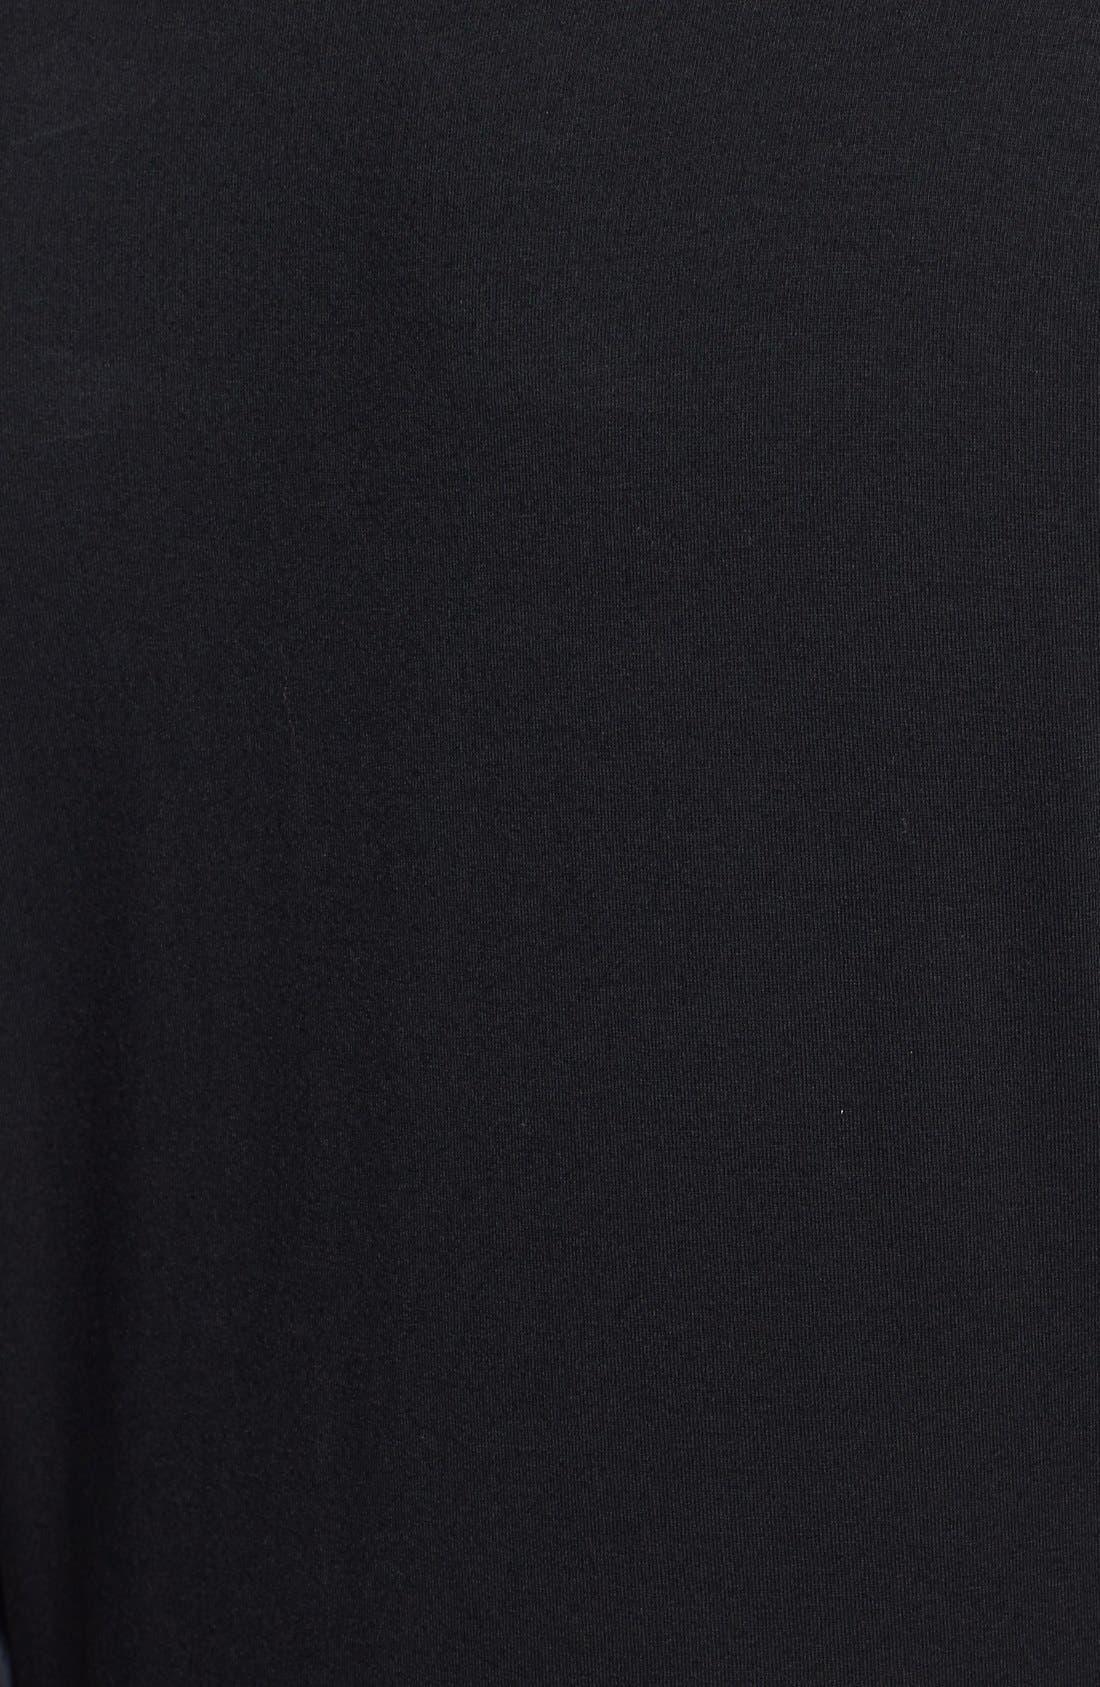 Alternate Image 3  - Vince Camuto Print Chiffon Sleeve Stretch Knit Top